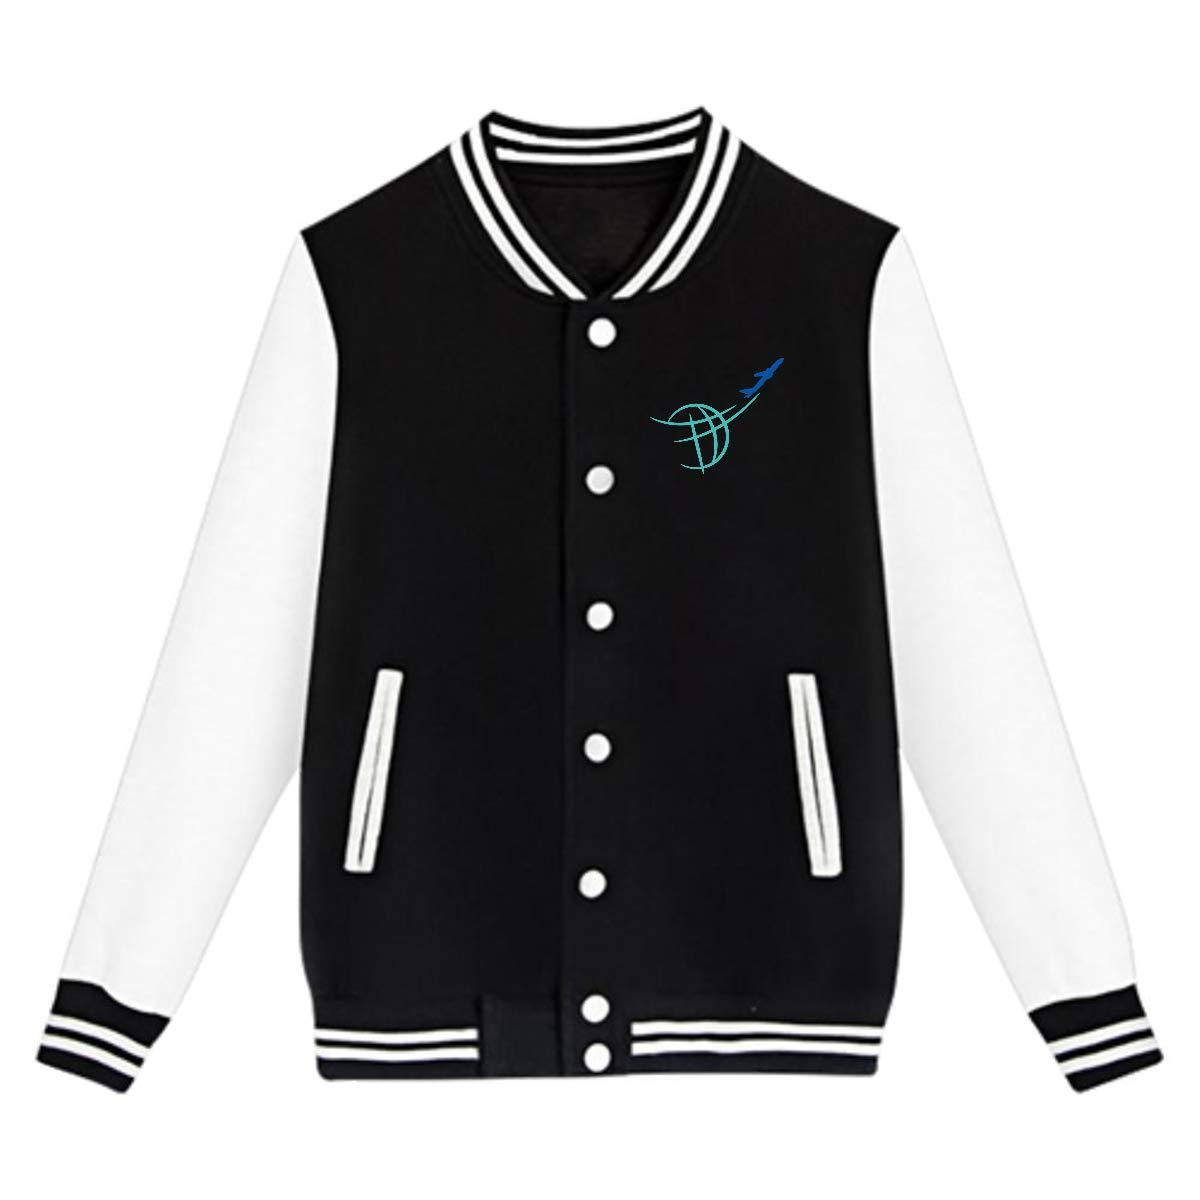 NJKM5MJ Unisex Youth Baseball Uniform Jacket Airline Clipart Coat Sport Outfit